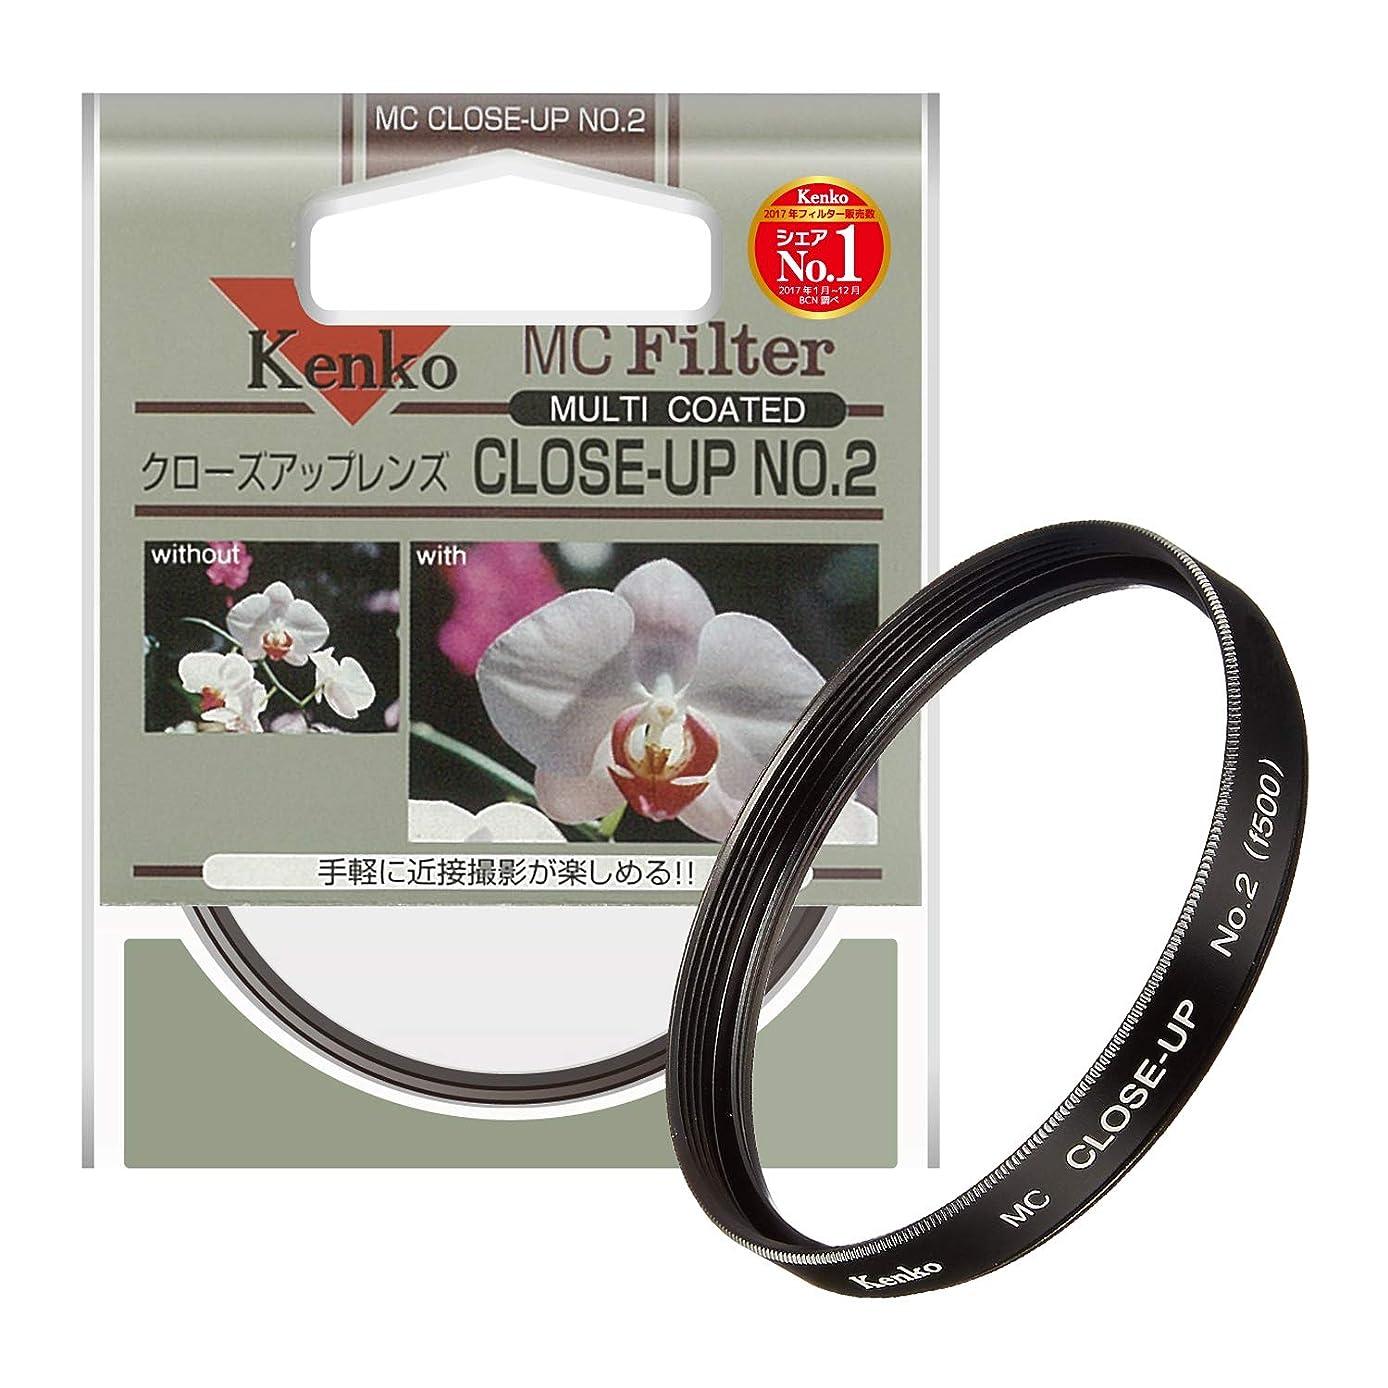 Kenko Close-Up Lens 52mm MC No.2 Multi-Coated